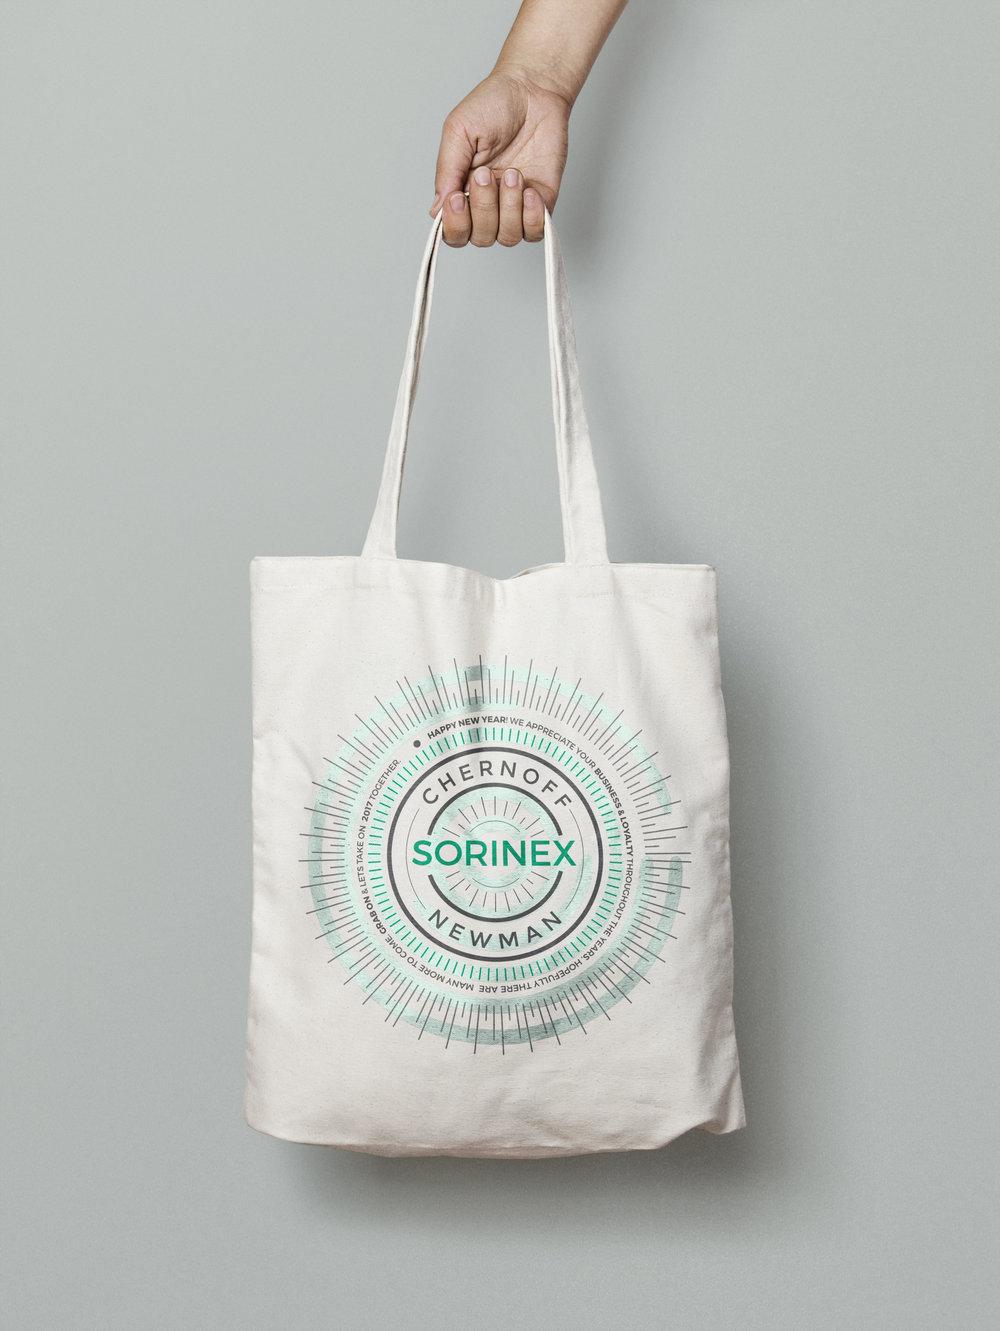 Chernoff Bag.jpg